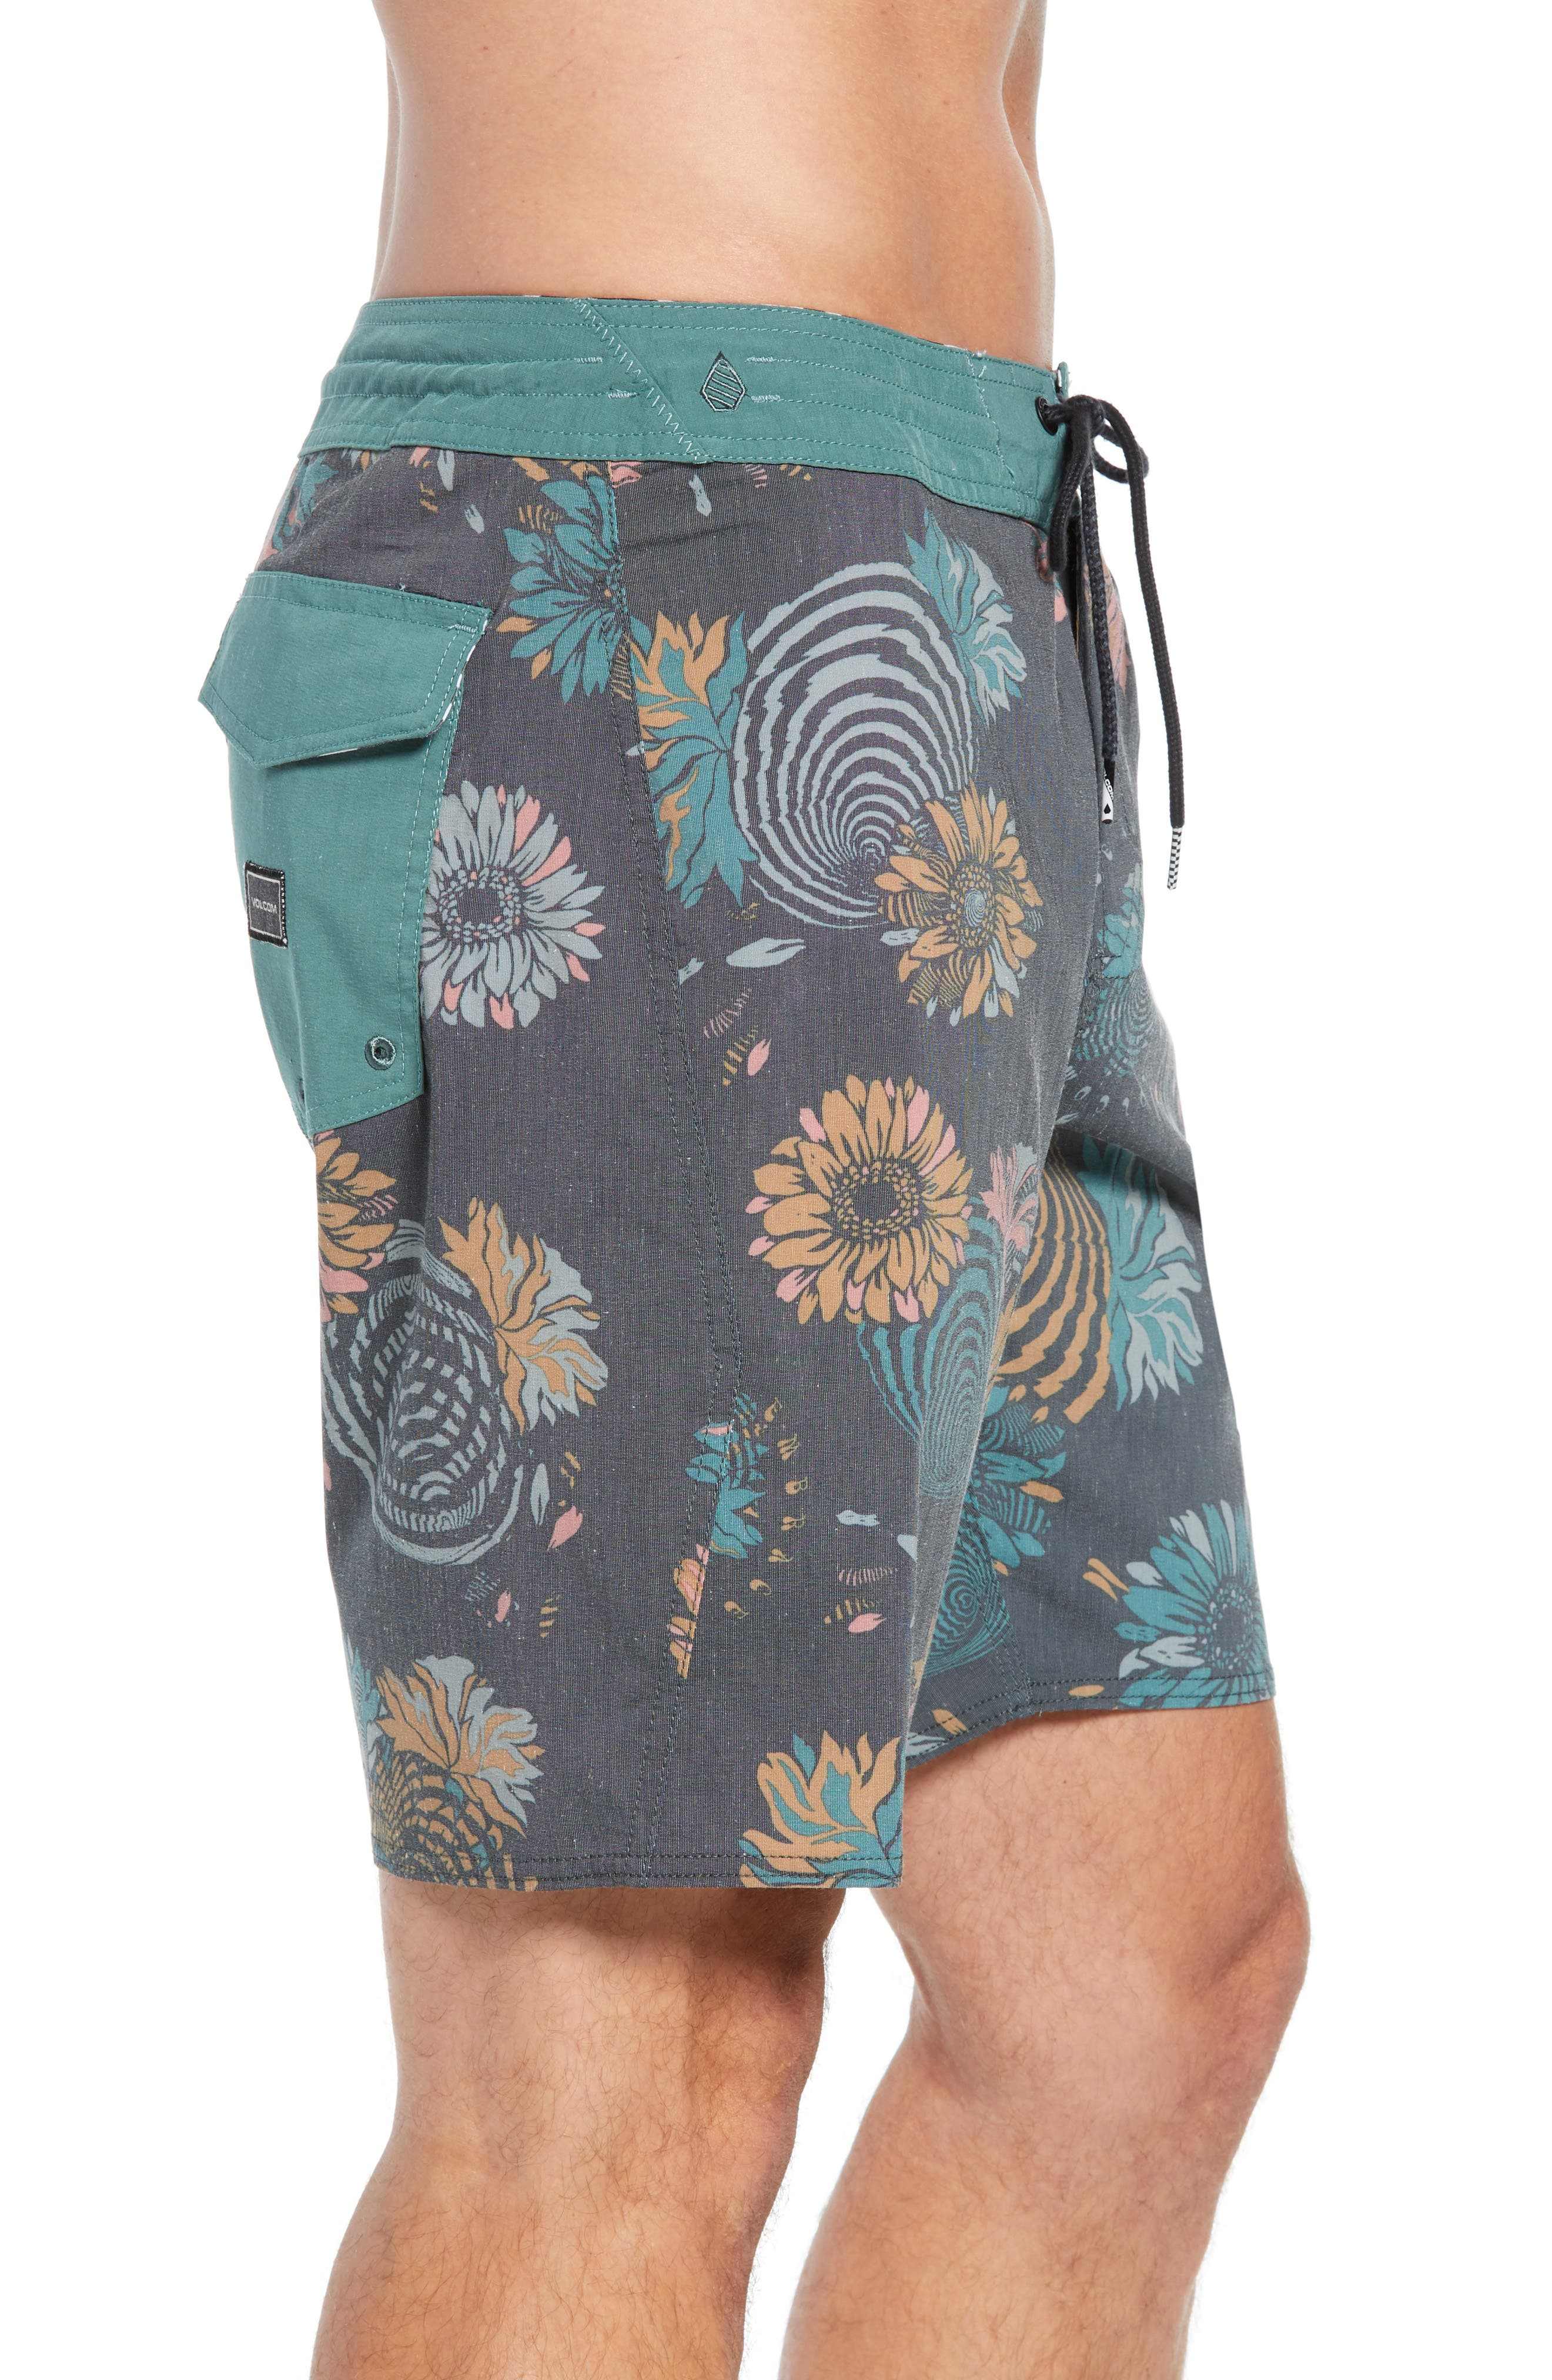 Delusion Stoney Board Shorts,                             Alternate thumbnail 3, color,                             366